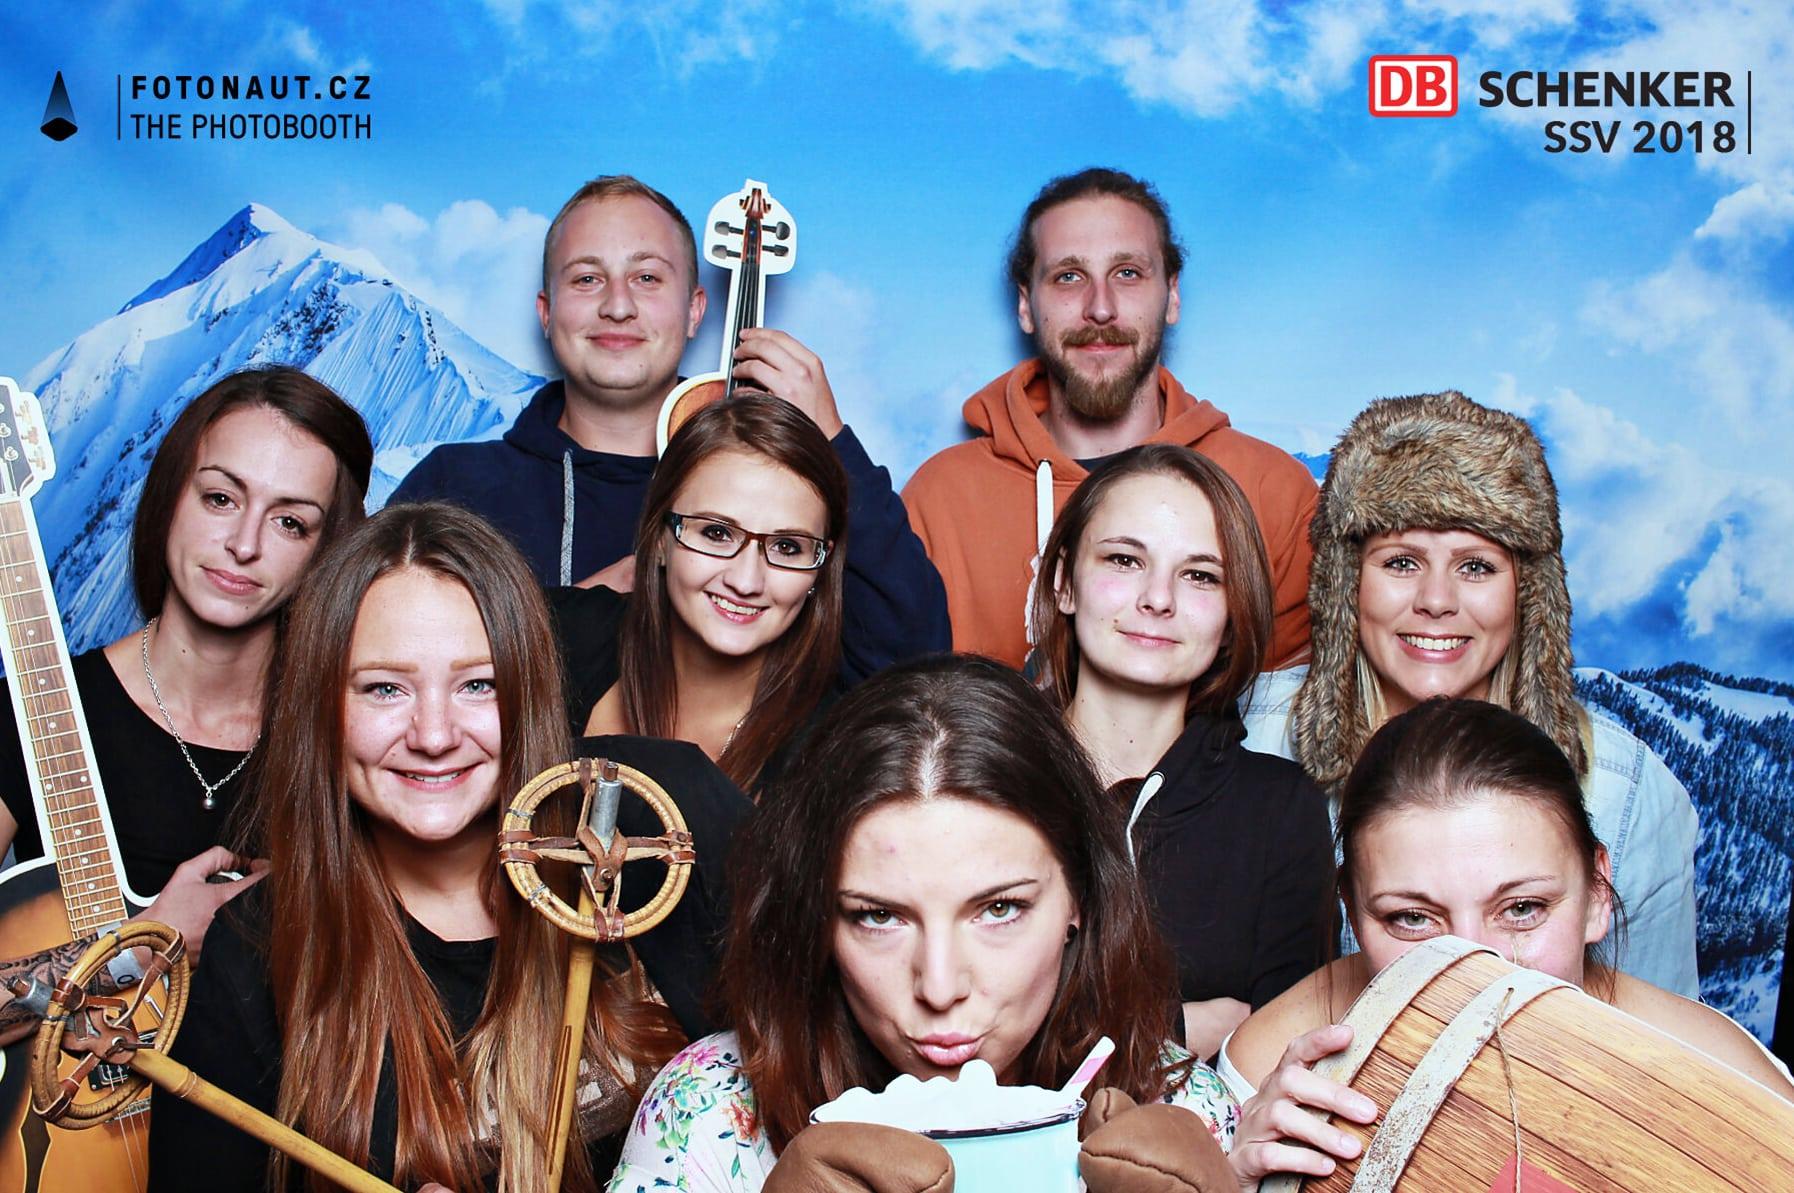 fotokoutek-db-schenker-22-9-2018-497312